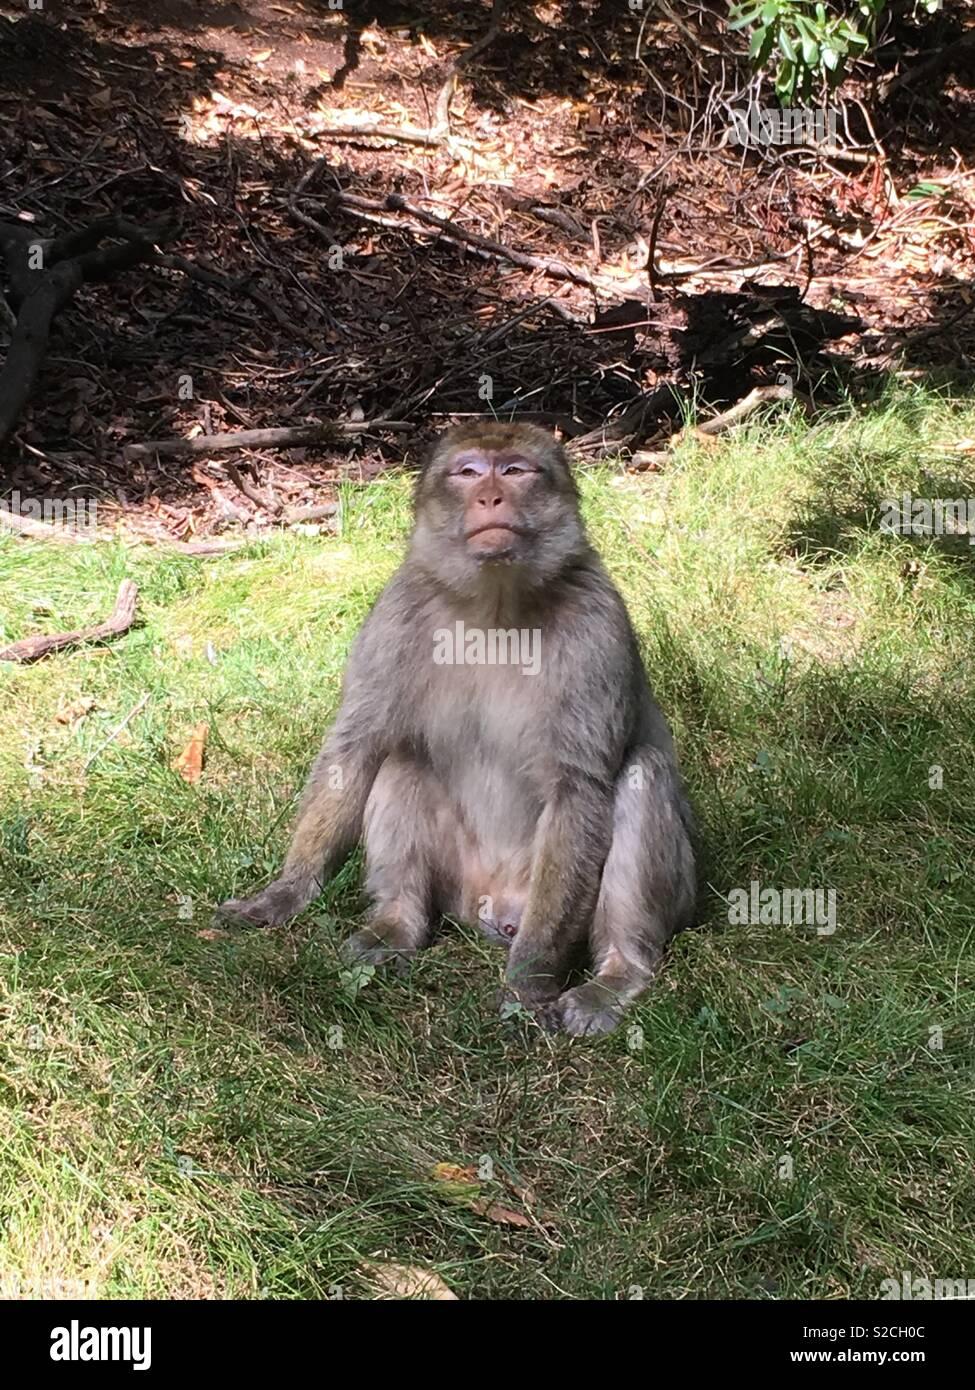 Contemplating monkey - Stock Image